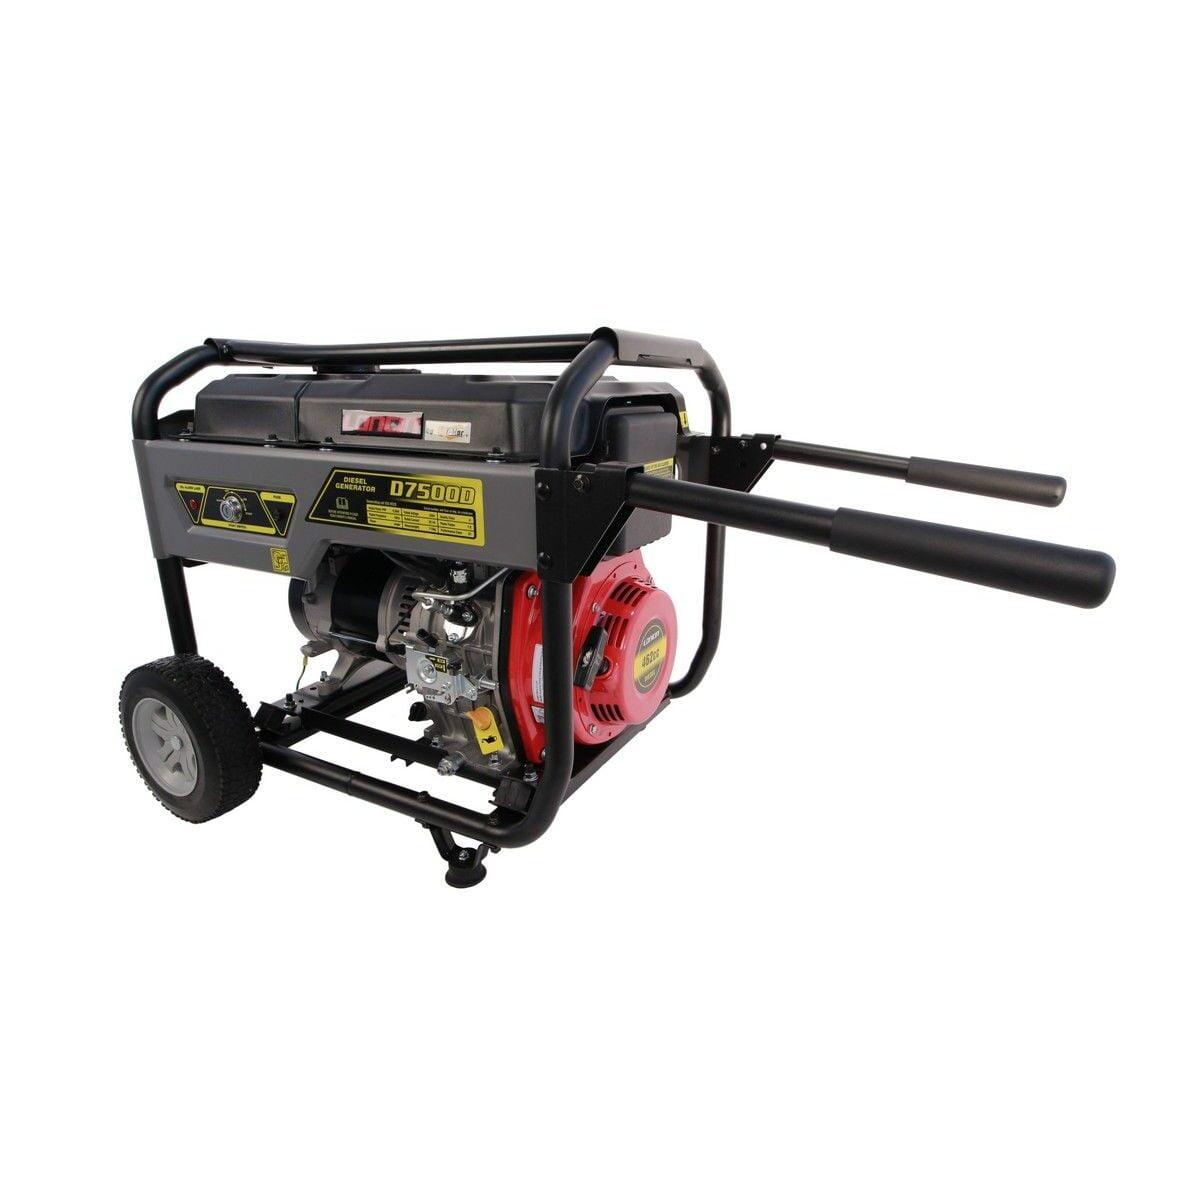 lcd7500d generator loncin 6 0kw 220v diesel o mac.ro 5